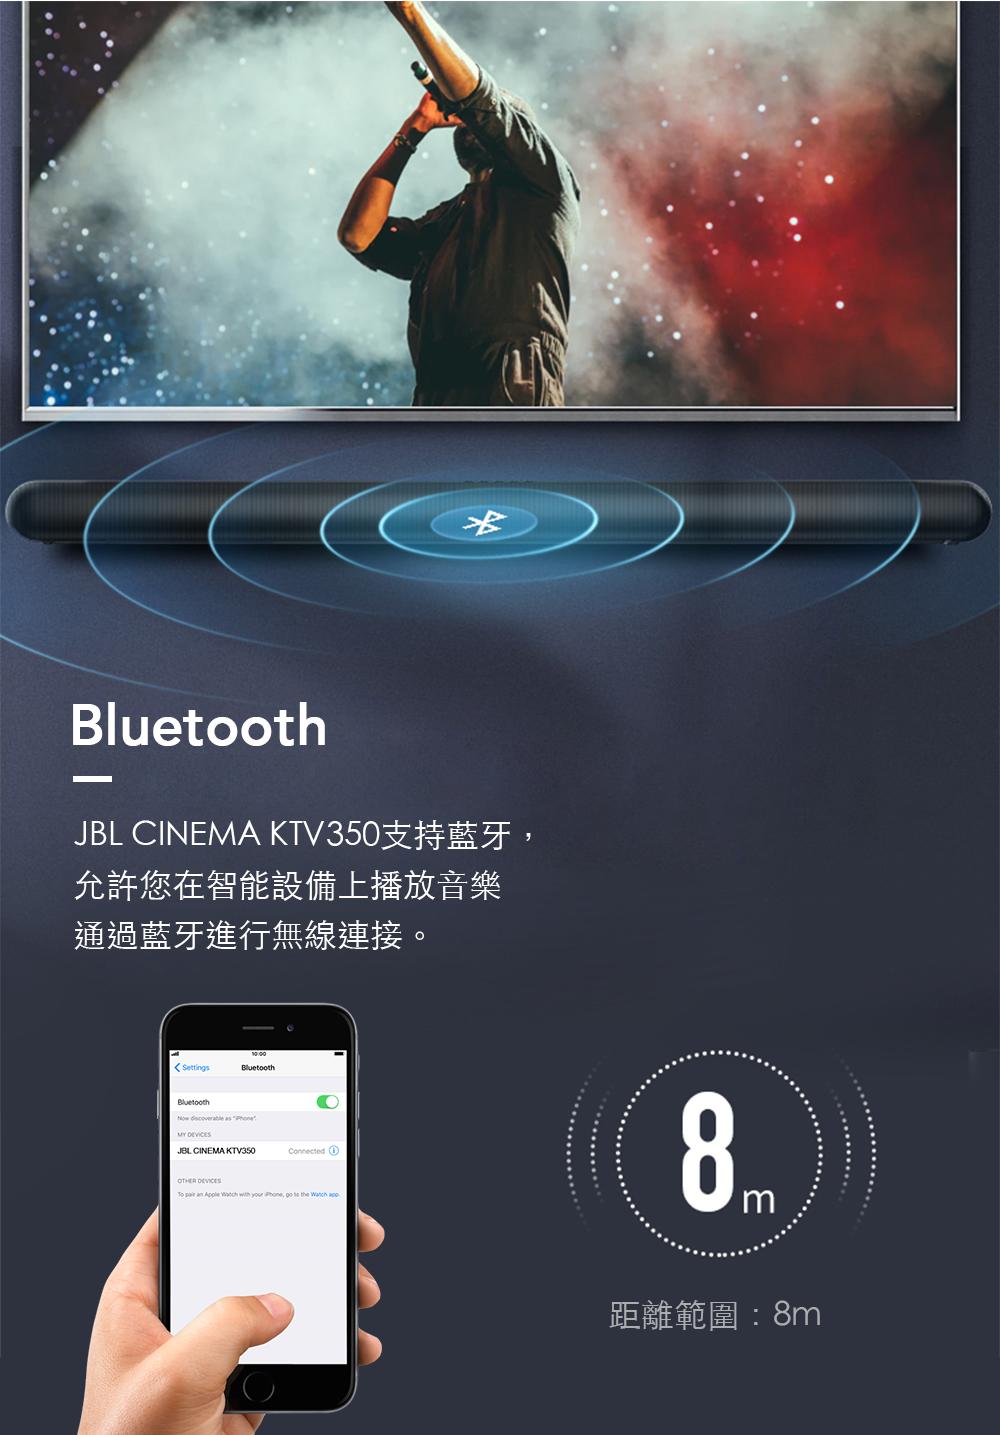 JBL-CINEMA-KTV350-Catalogue-(繁體中文)6.png